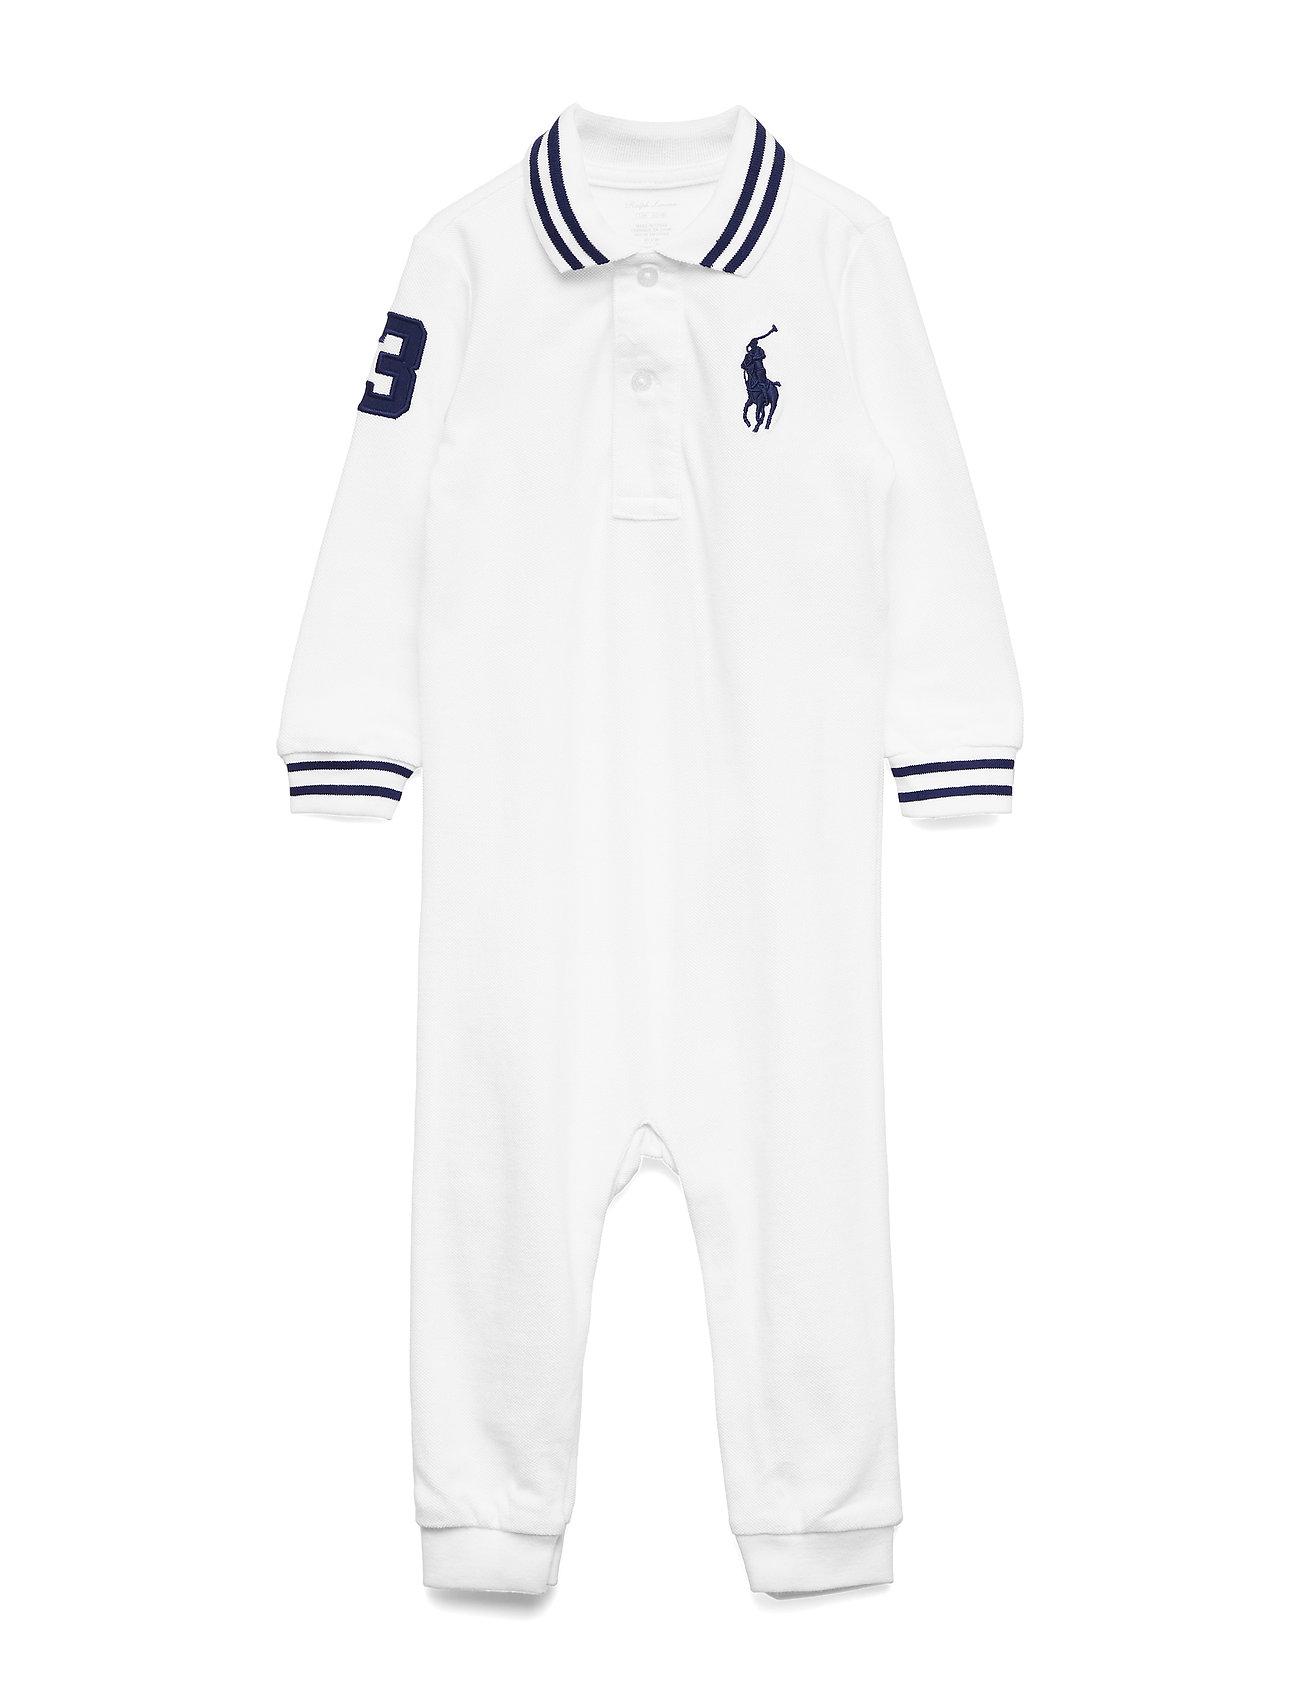 Ralph Lauren Baby Cotton Mesh Polo Coverall - WHITE